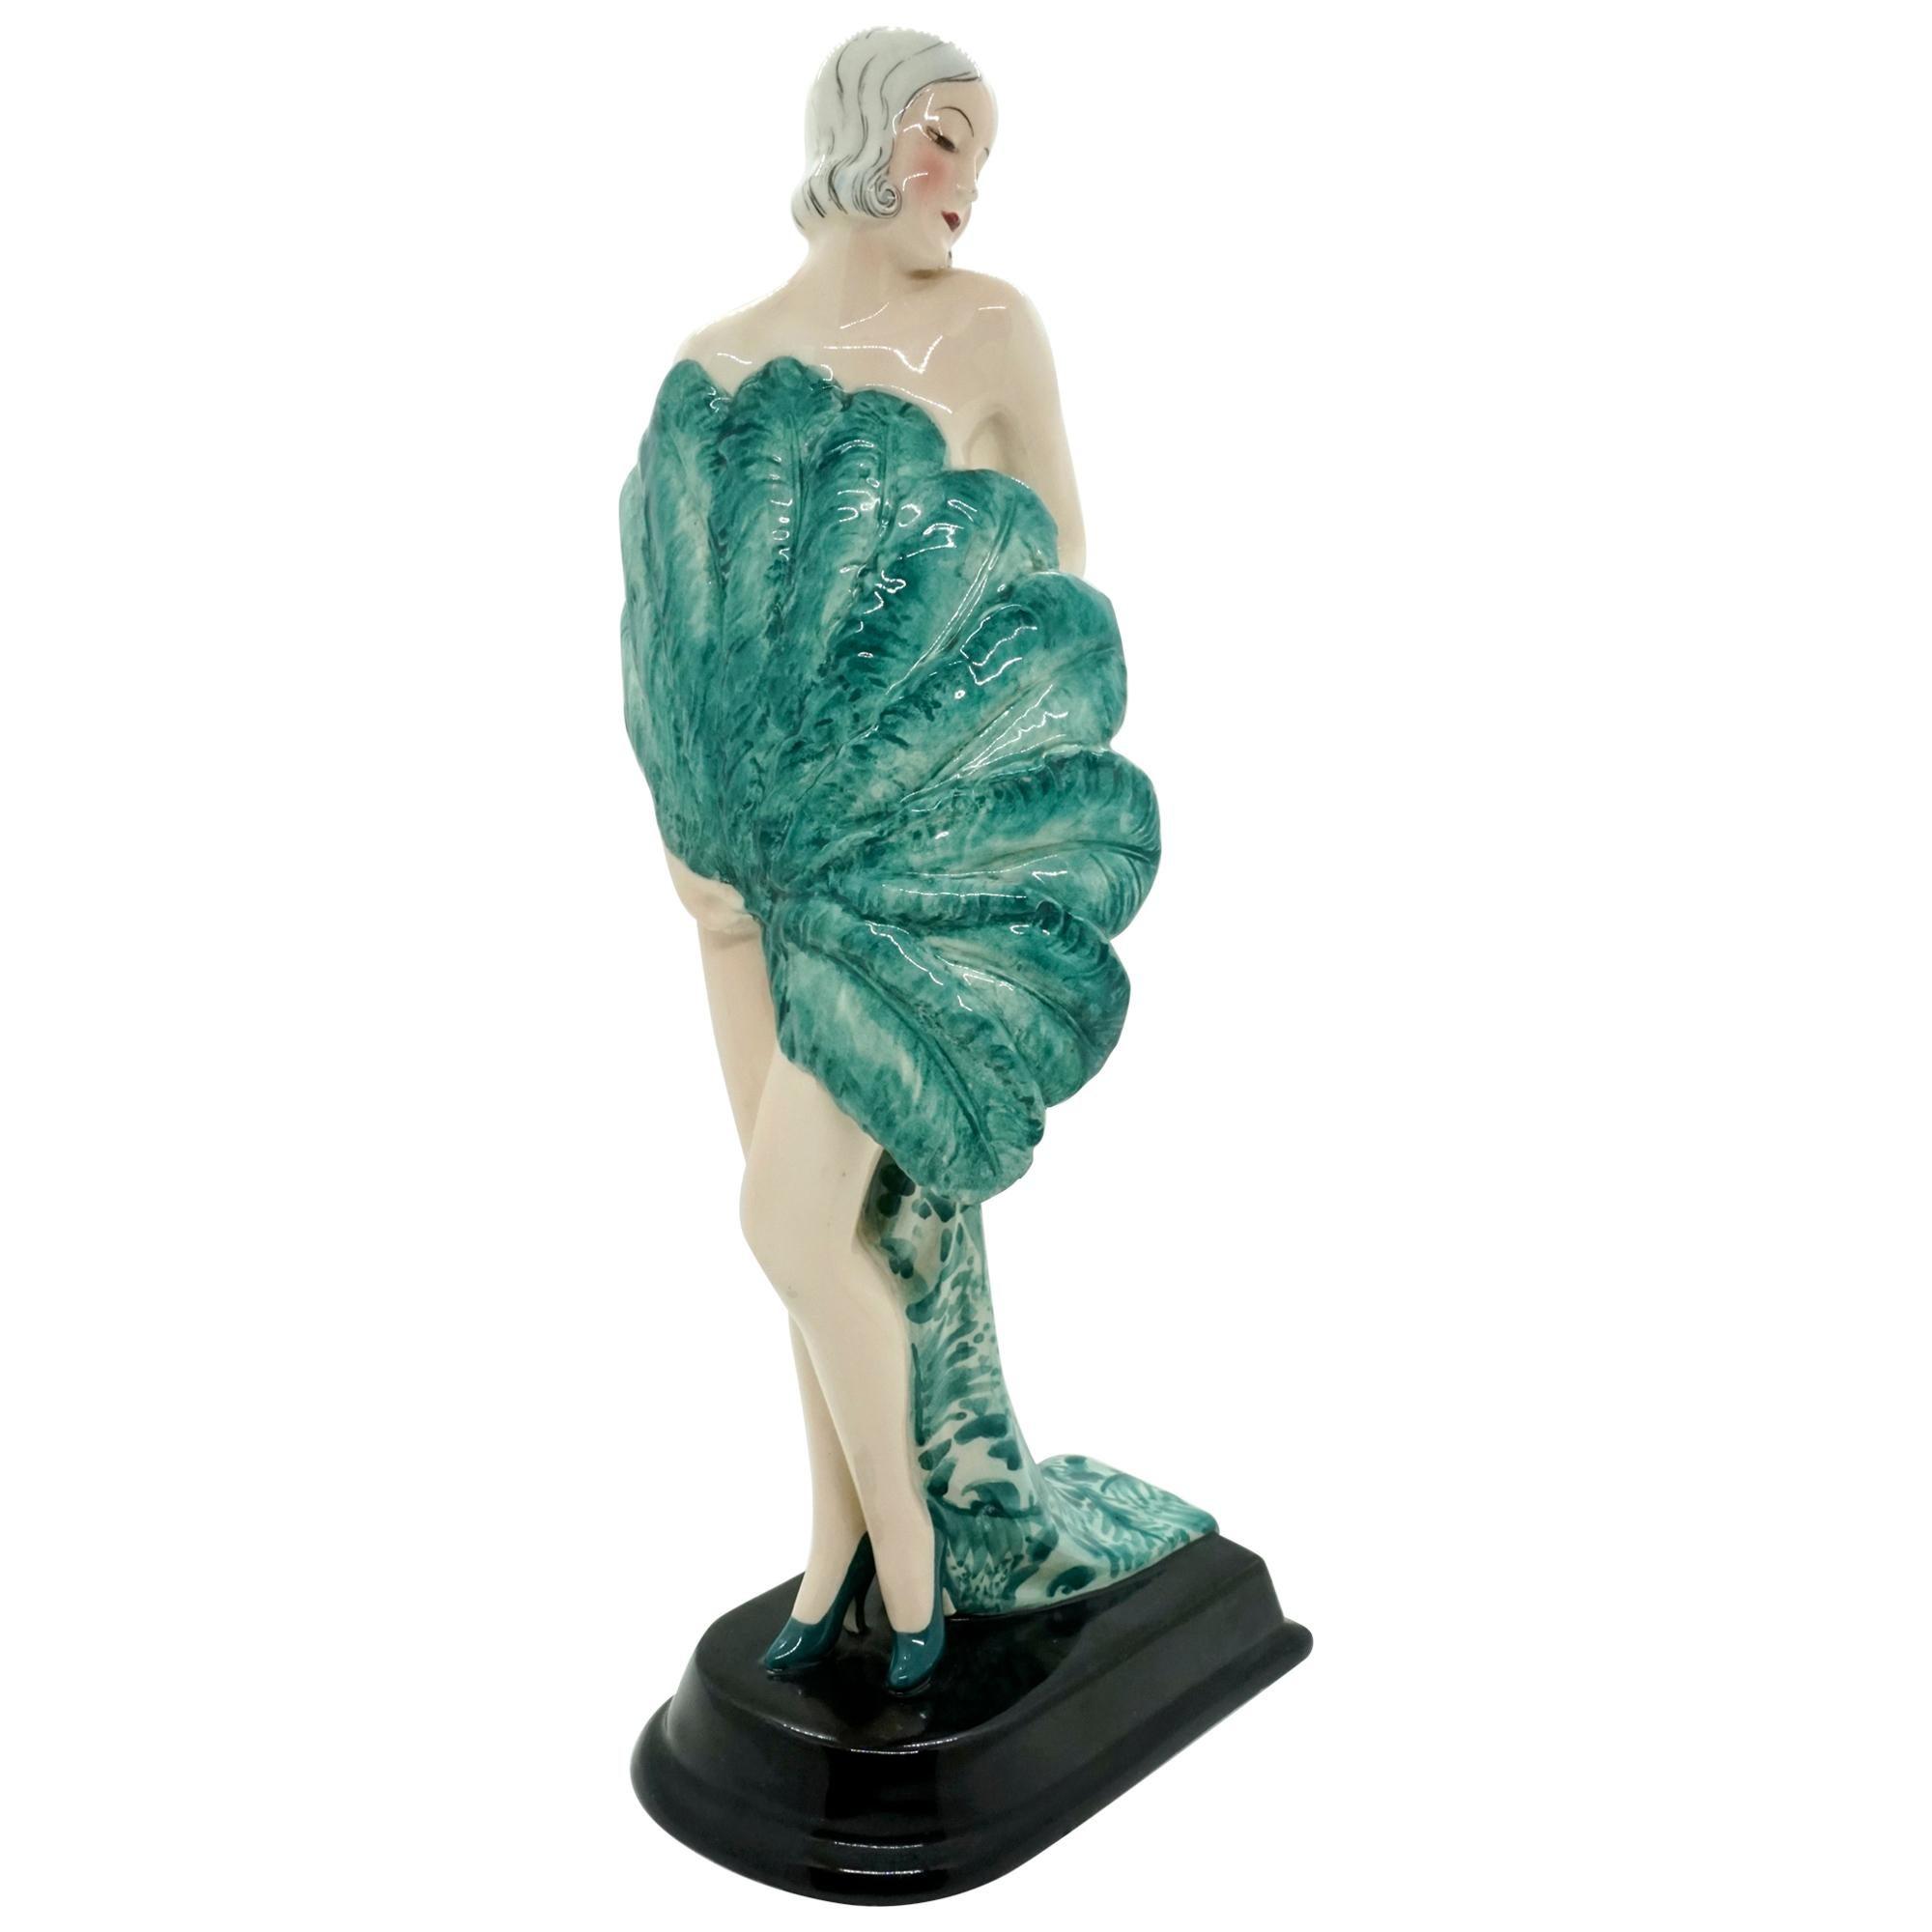 Goldscheider Vienna Art Deco Figurine 'Fan Lady' by Stephan Dakon, circa 1930